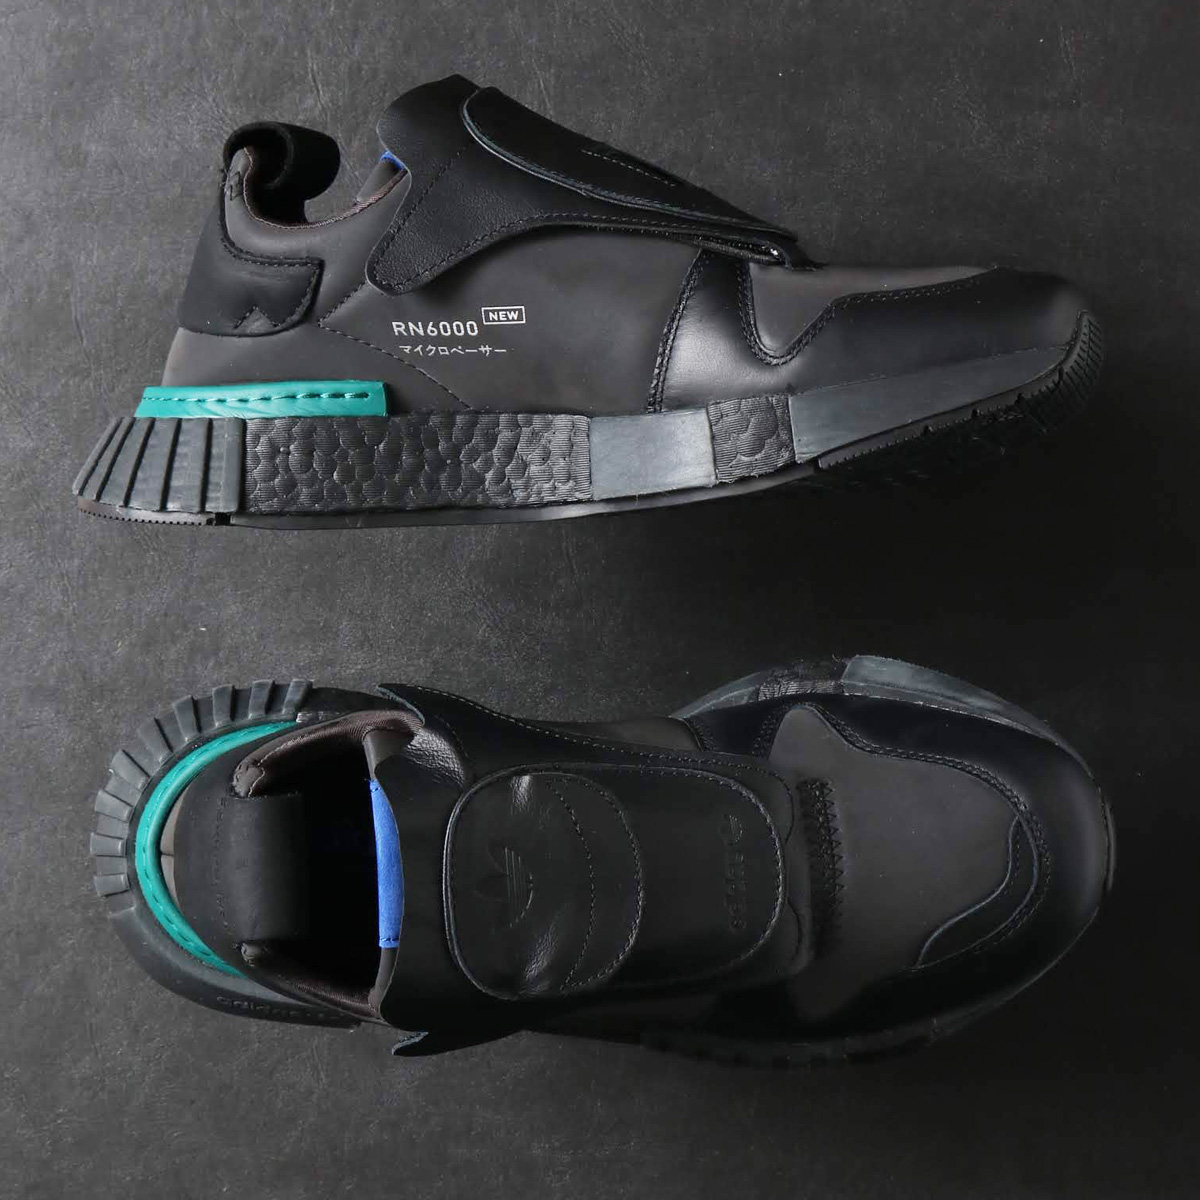 adidas Originals FUTUREPACER (アディダスオリジナルス フューチャーペーサー) CORE BLACK/CARBON/RUNNING WHITE【メンズ スニーカー】18FW-S